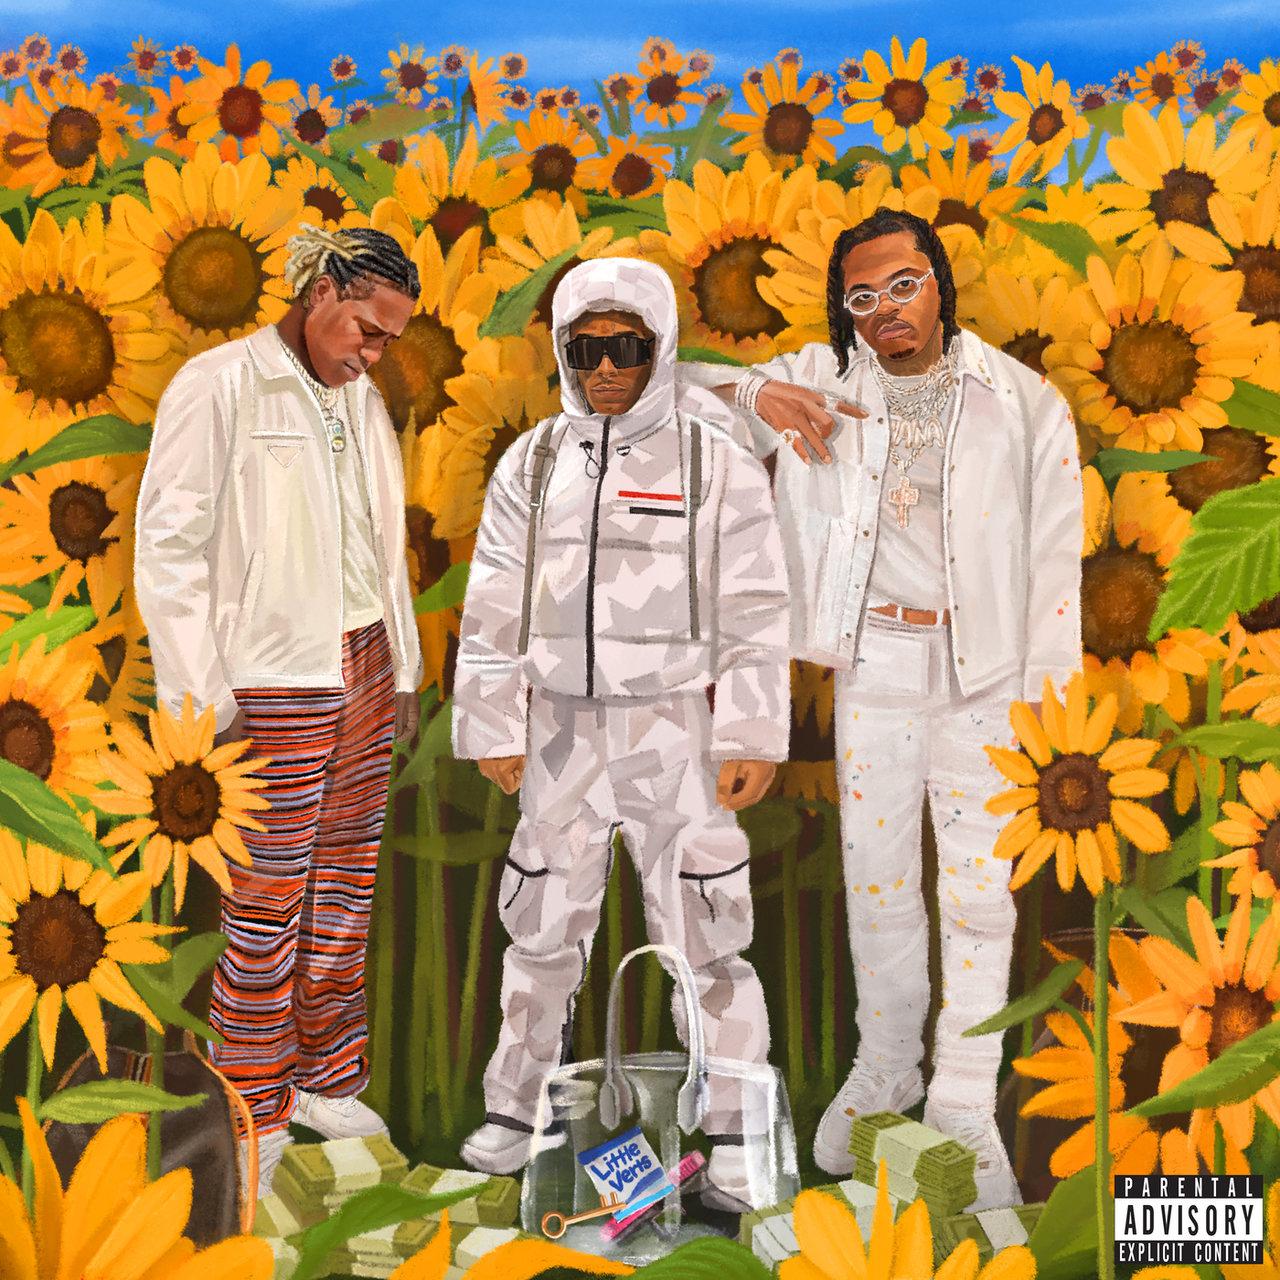 DOWNLOAD MP3: Internet Money Ft. Don Toliver, Lil Uzi Vert & Gunna – His & Hers